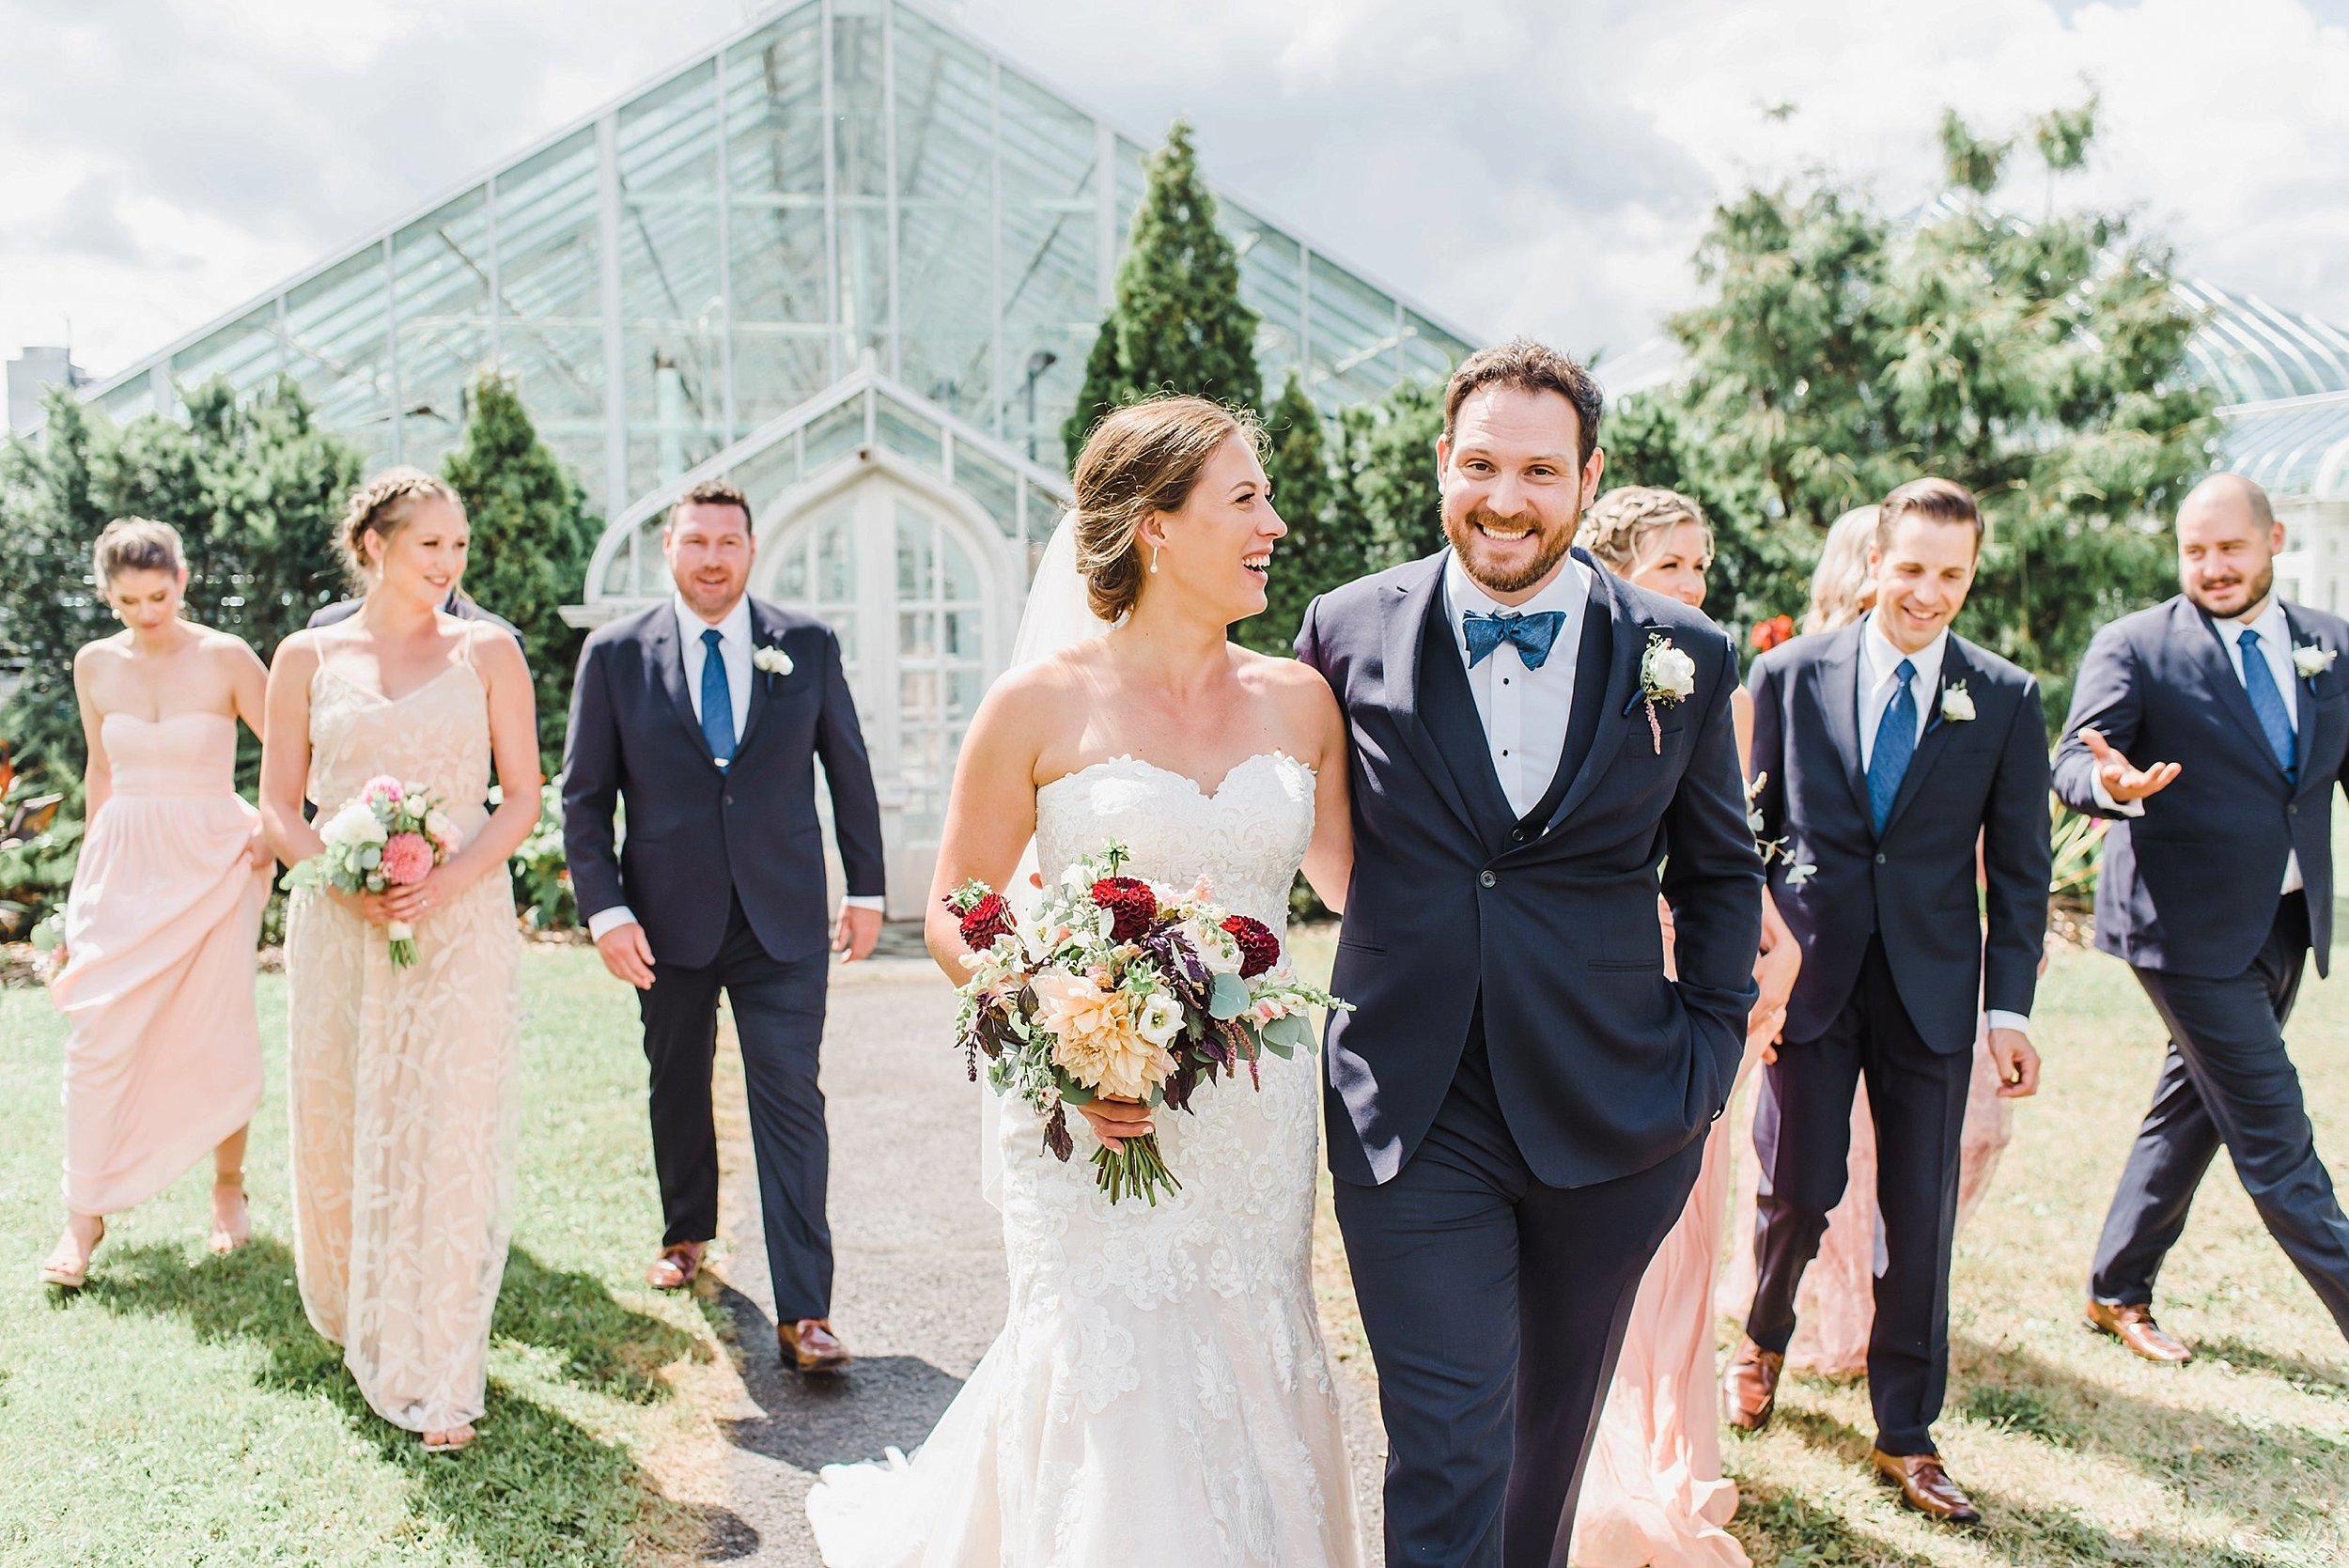 light airy indie fine art ottawa wedding photographer   Ali and Batoul Photography_1018.jpg